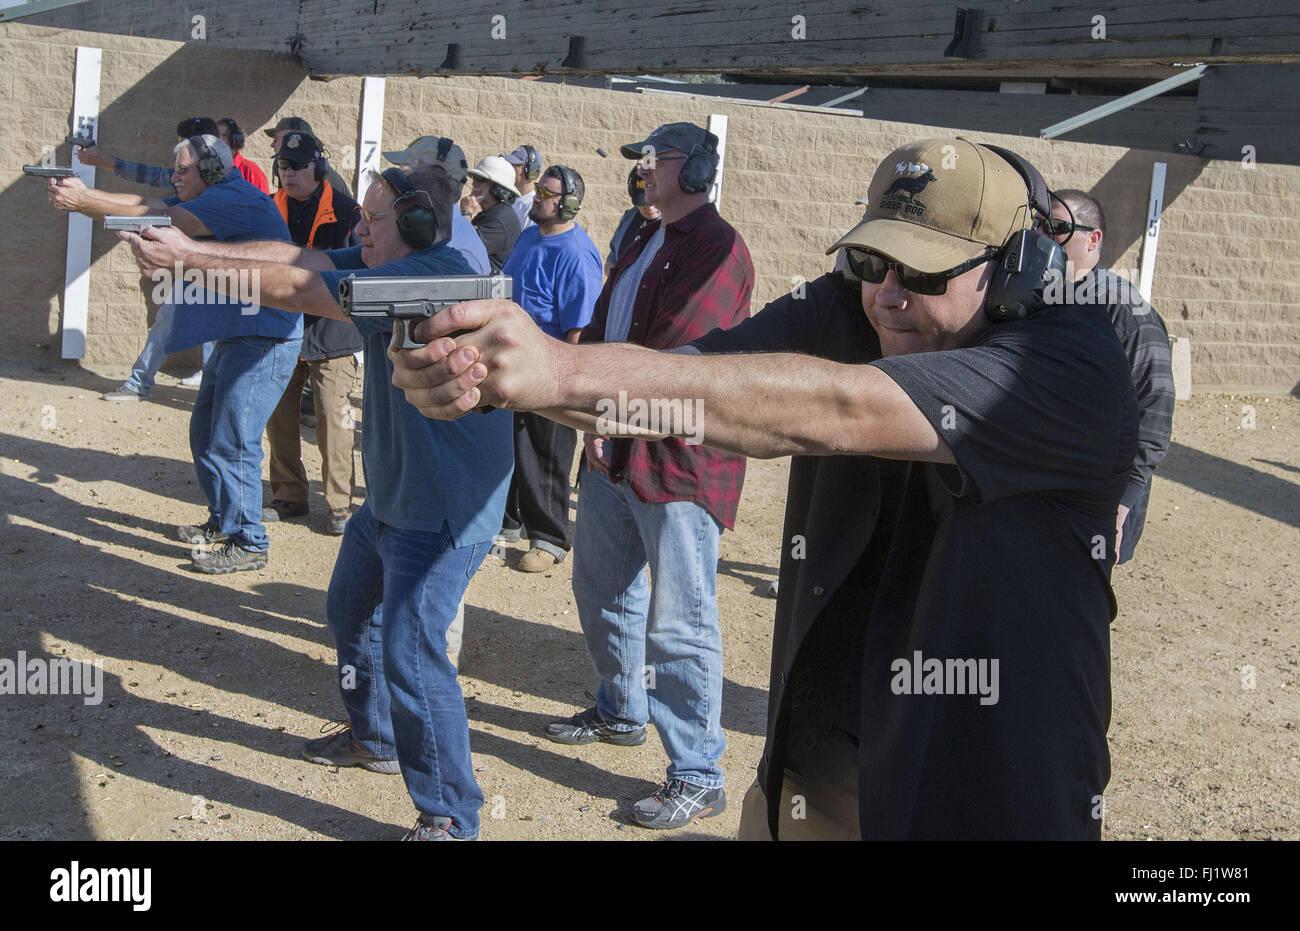 Gang Members Usa Stockfotos & Gang Members Usa Bilder - Alamy